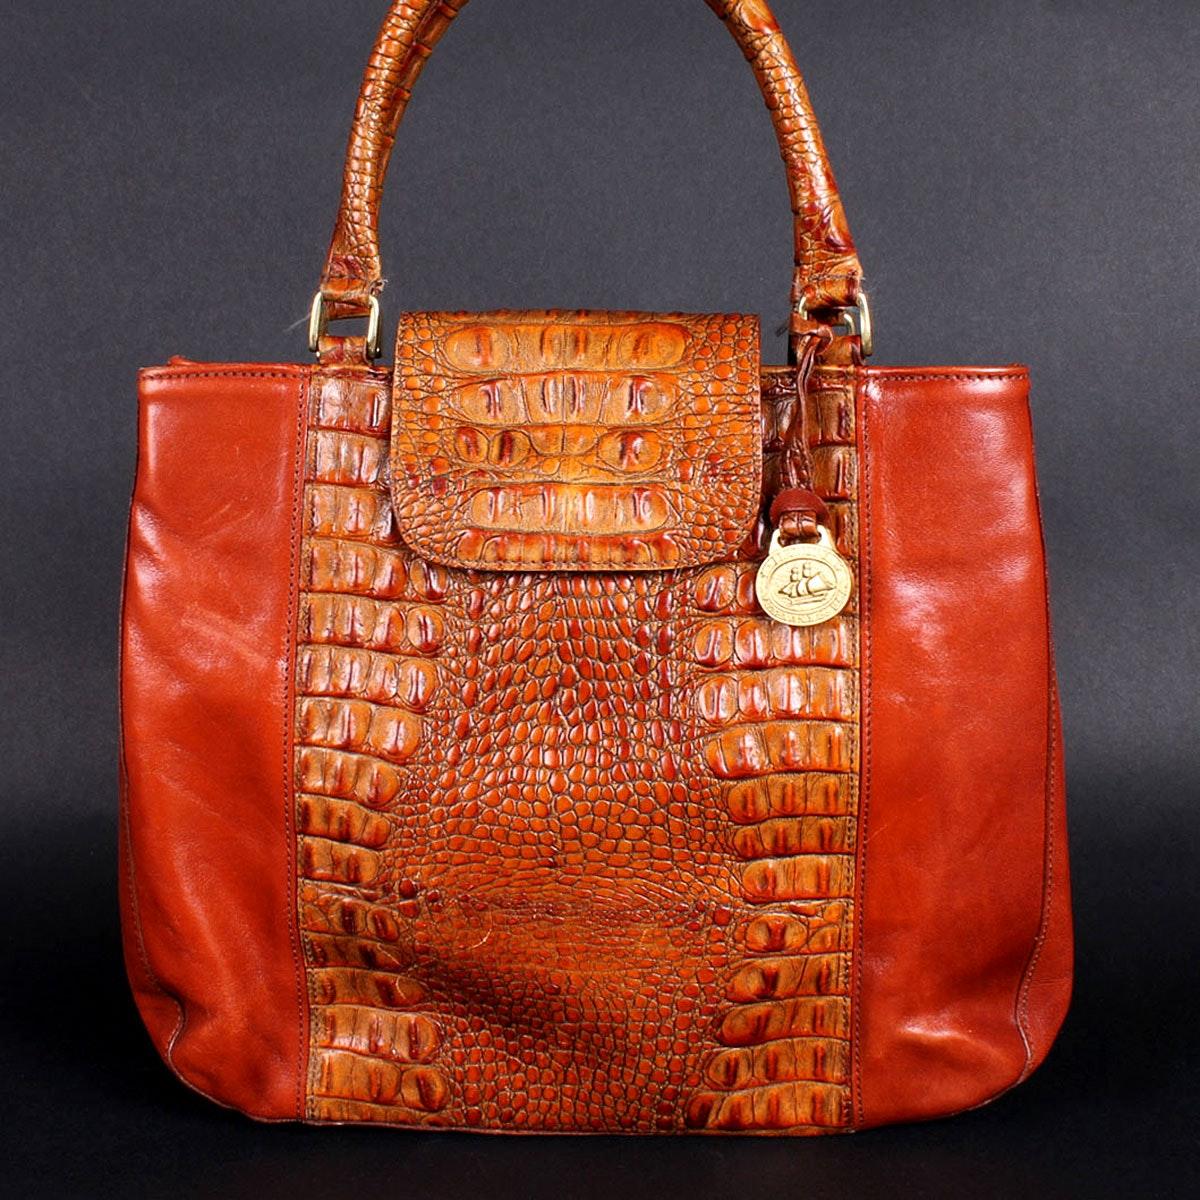 Brahmin Leather Handbag with Faux Croc Accents